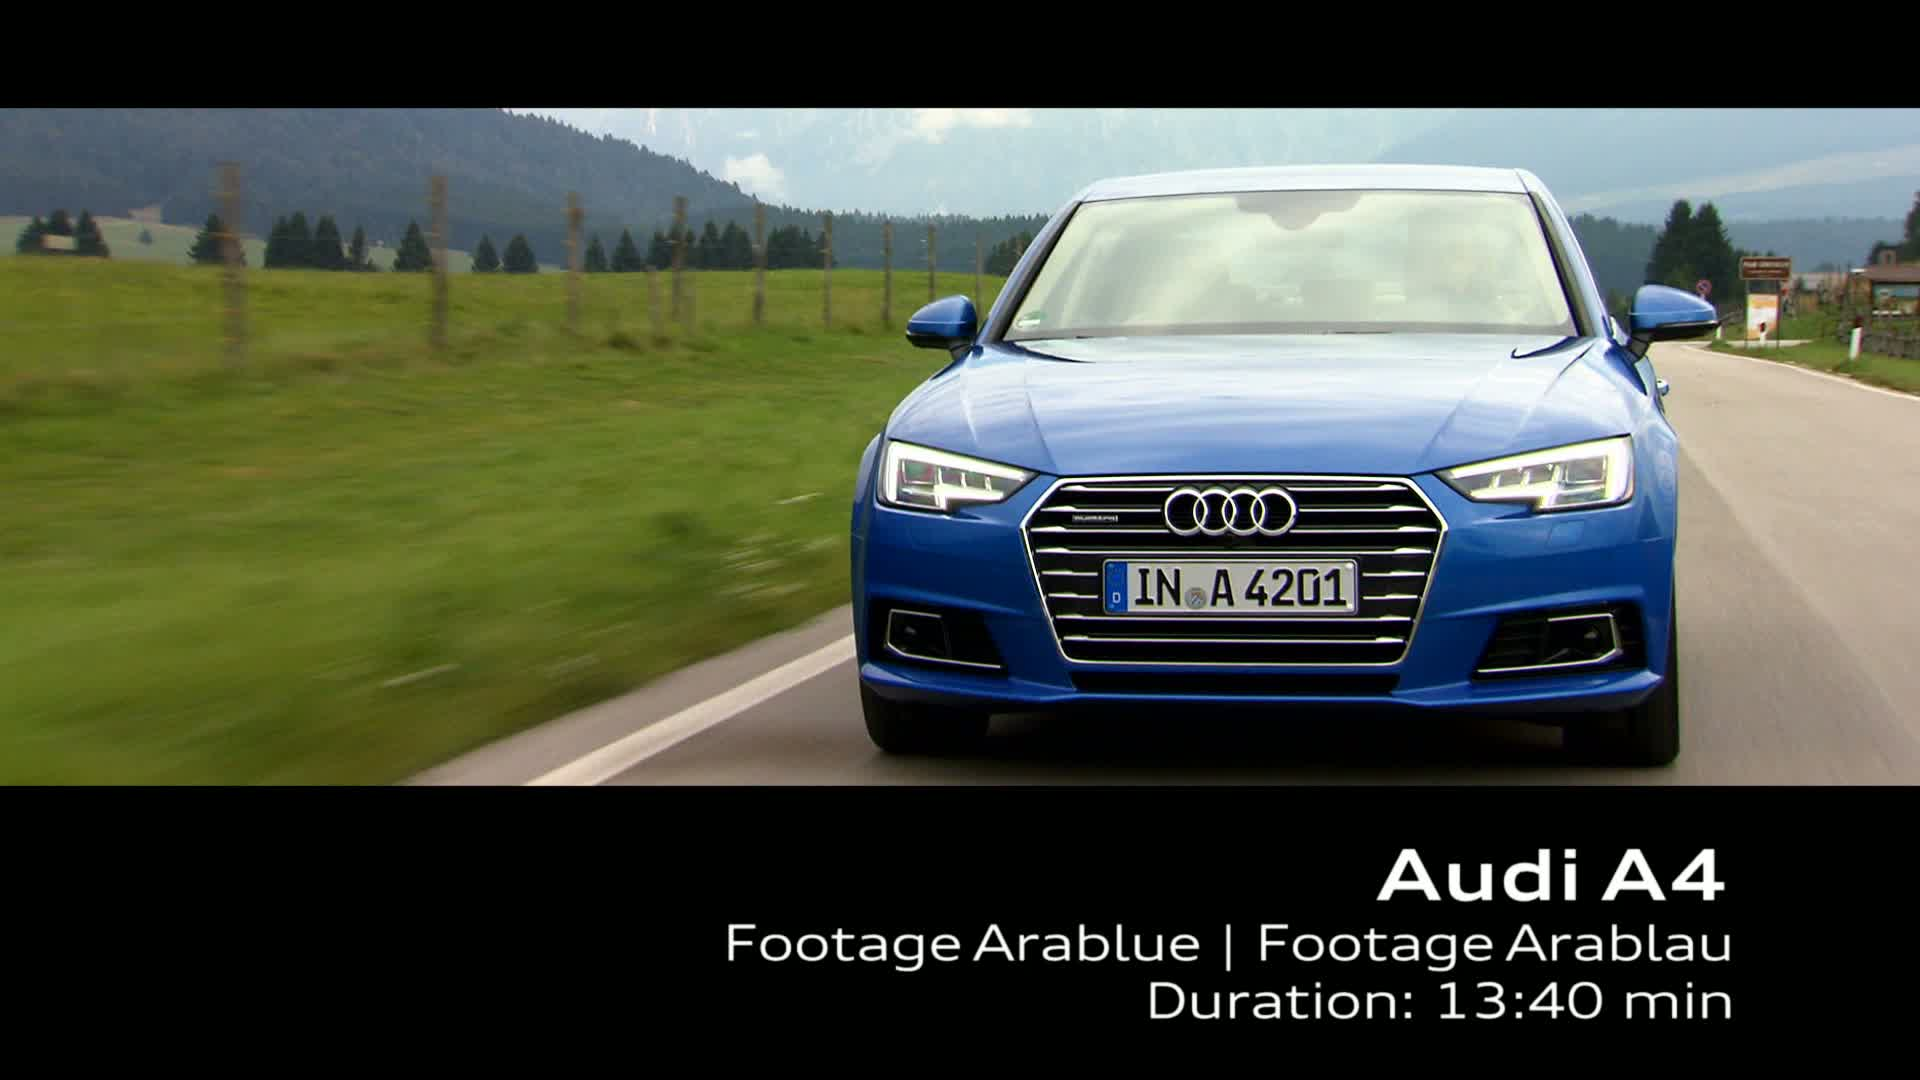 Audi A4 - Footage on Location